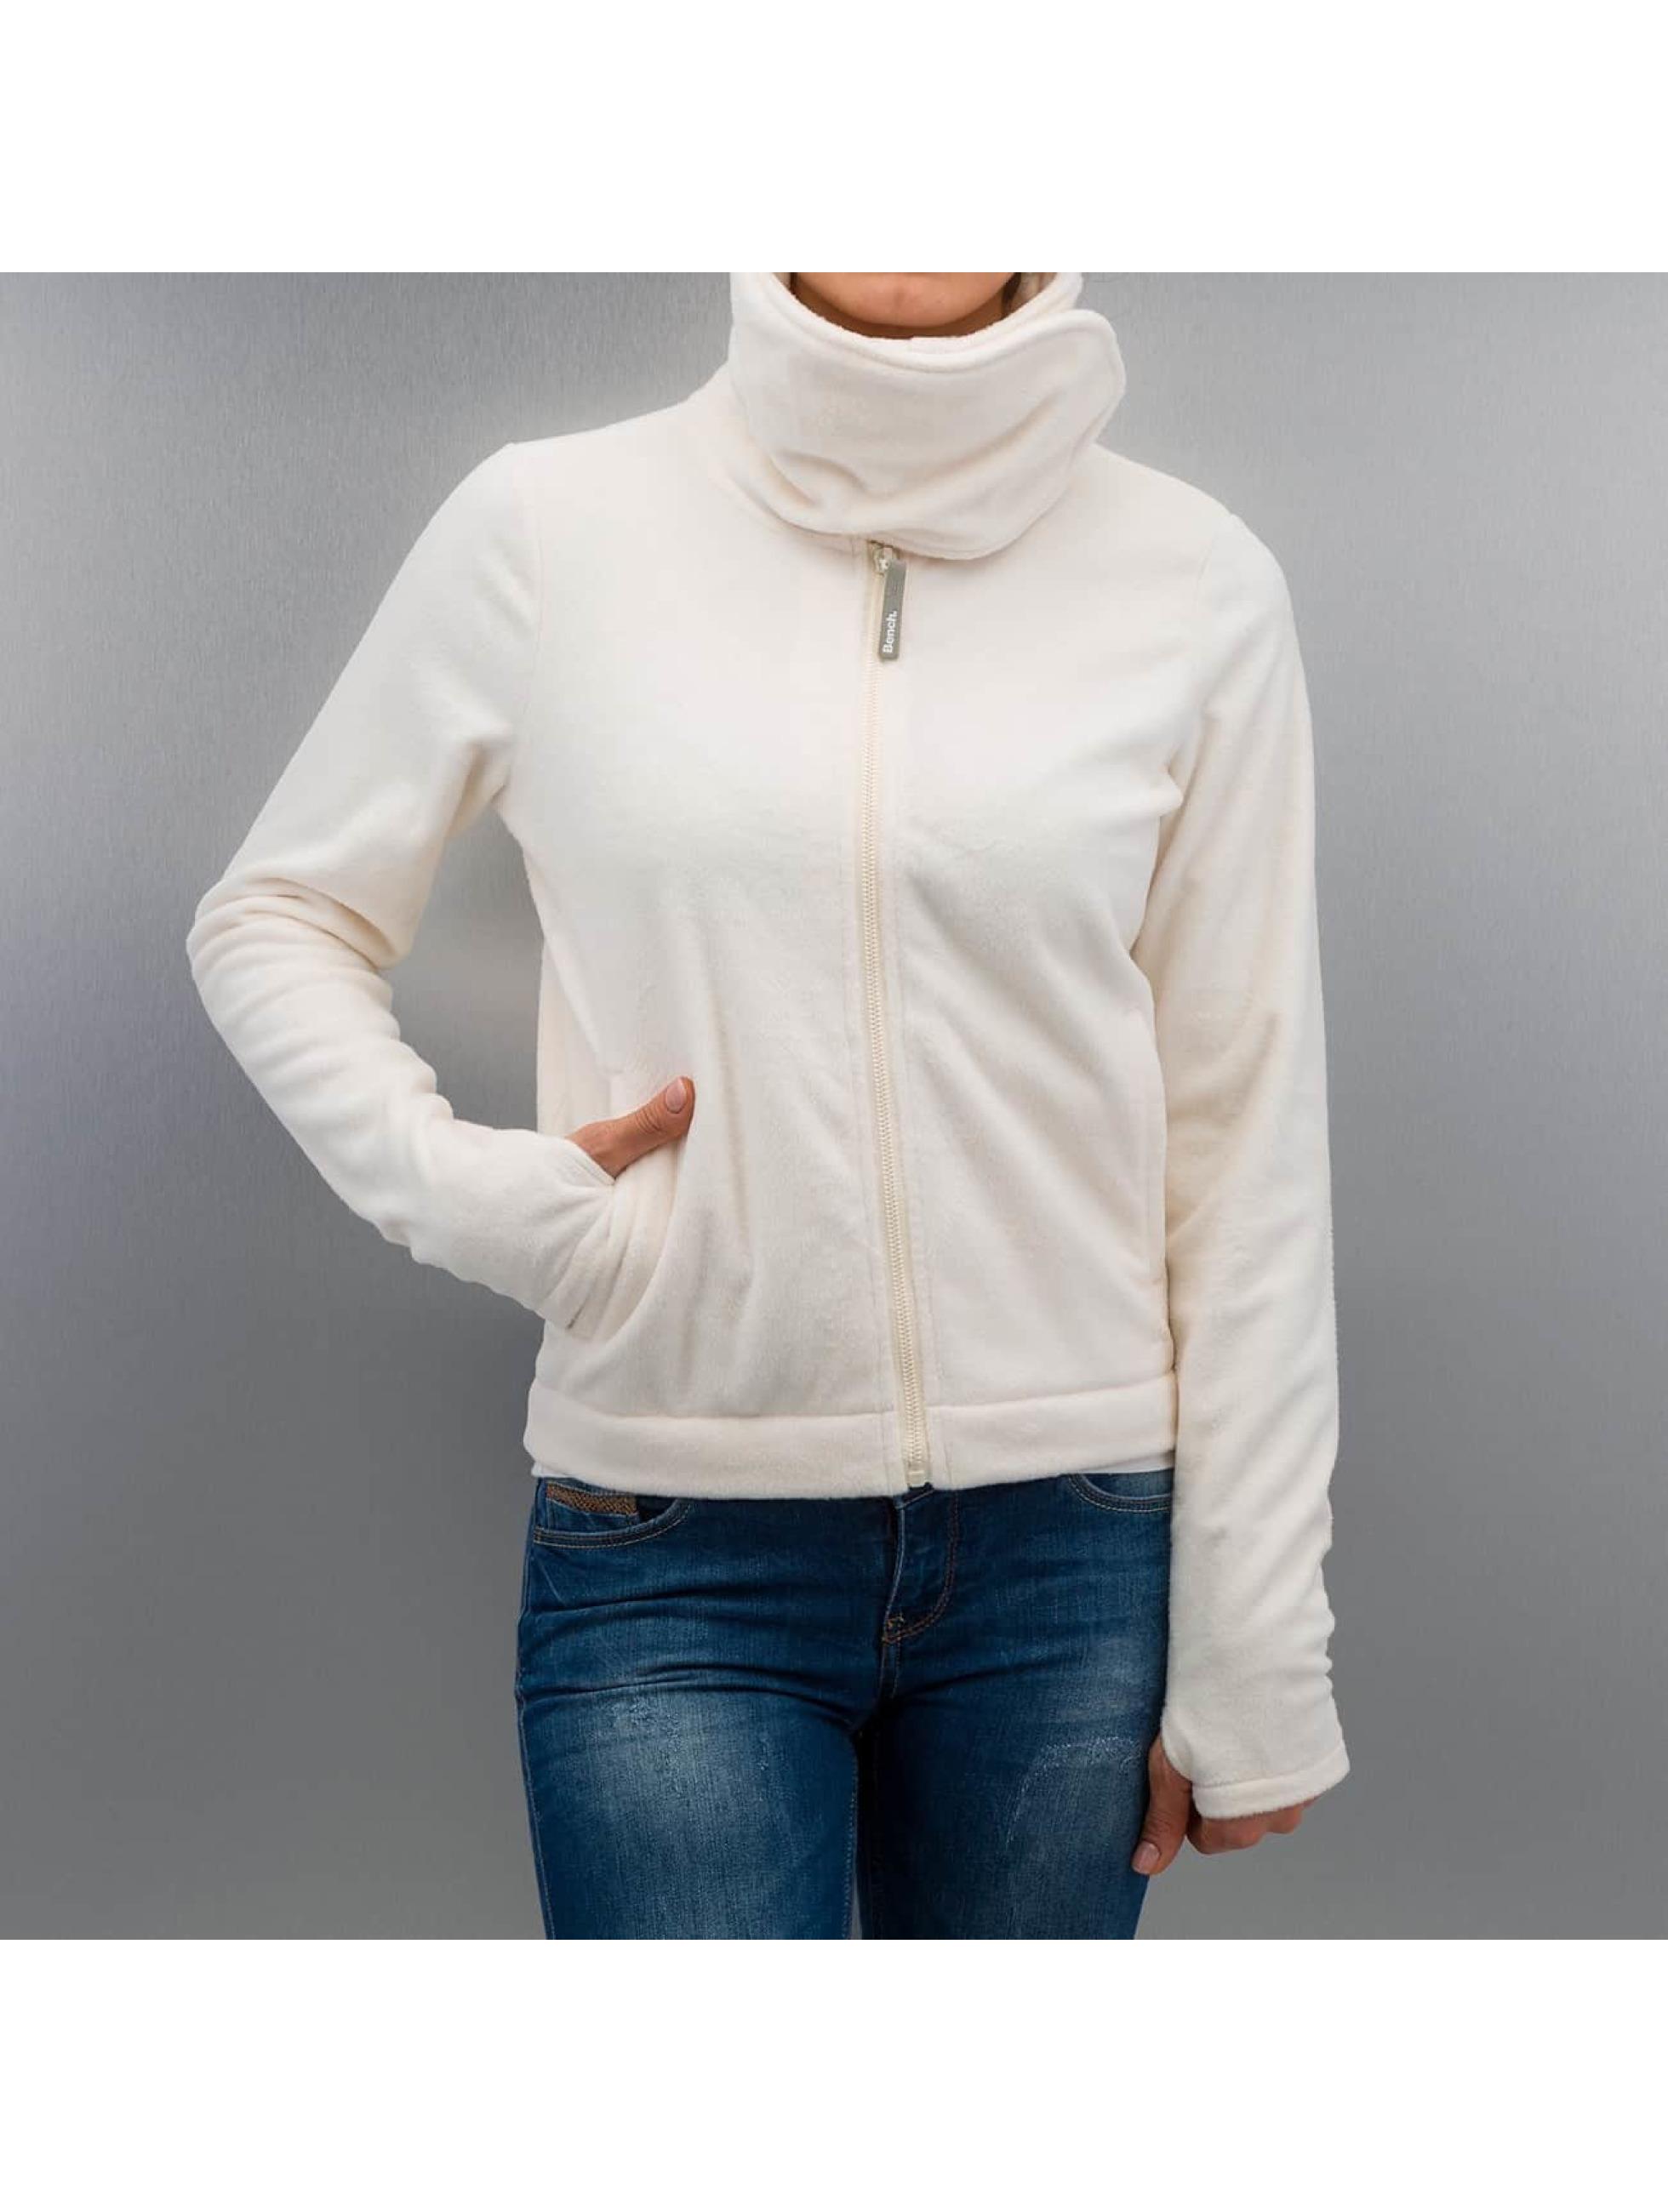 Bench Демисезонная куртка Difference Fleece Jacket бежевый